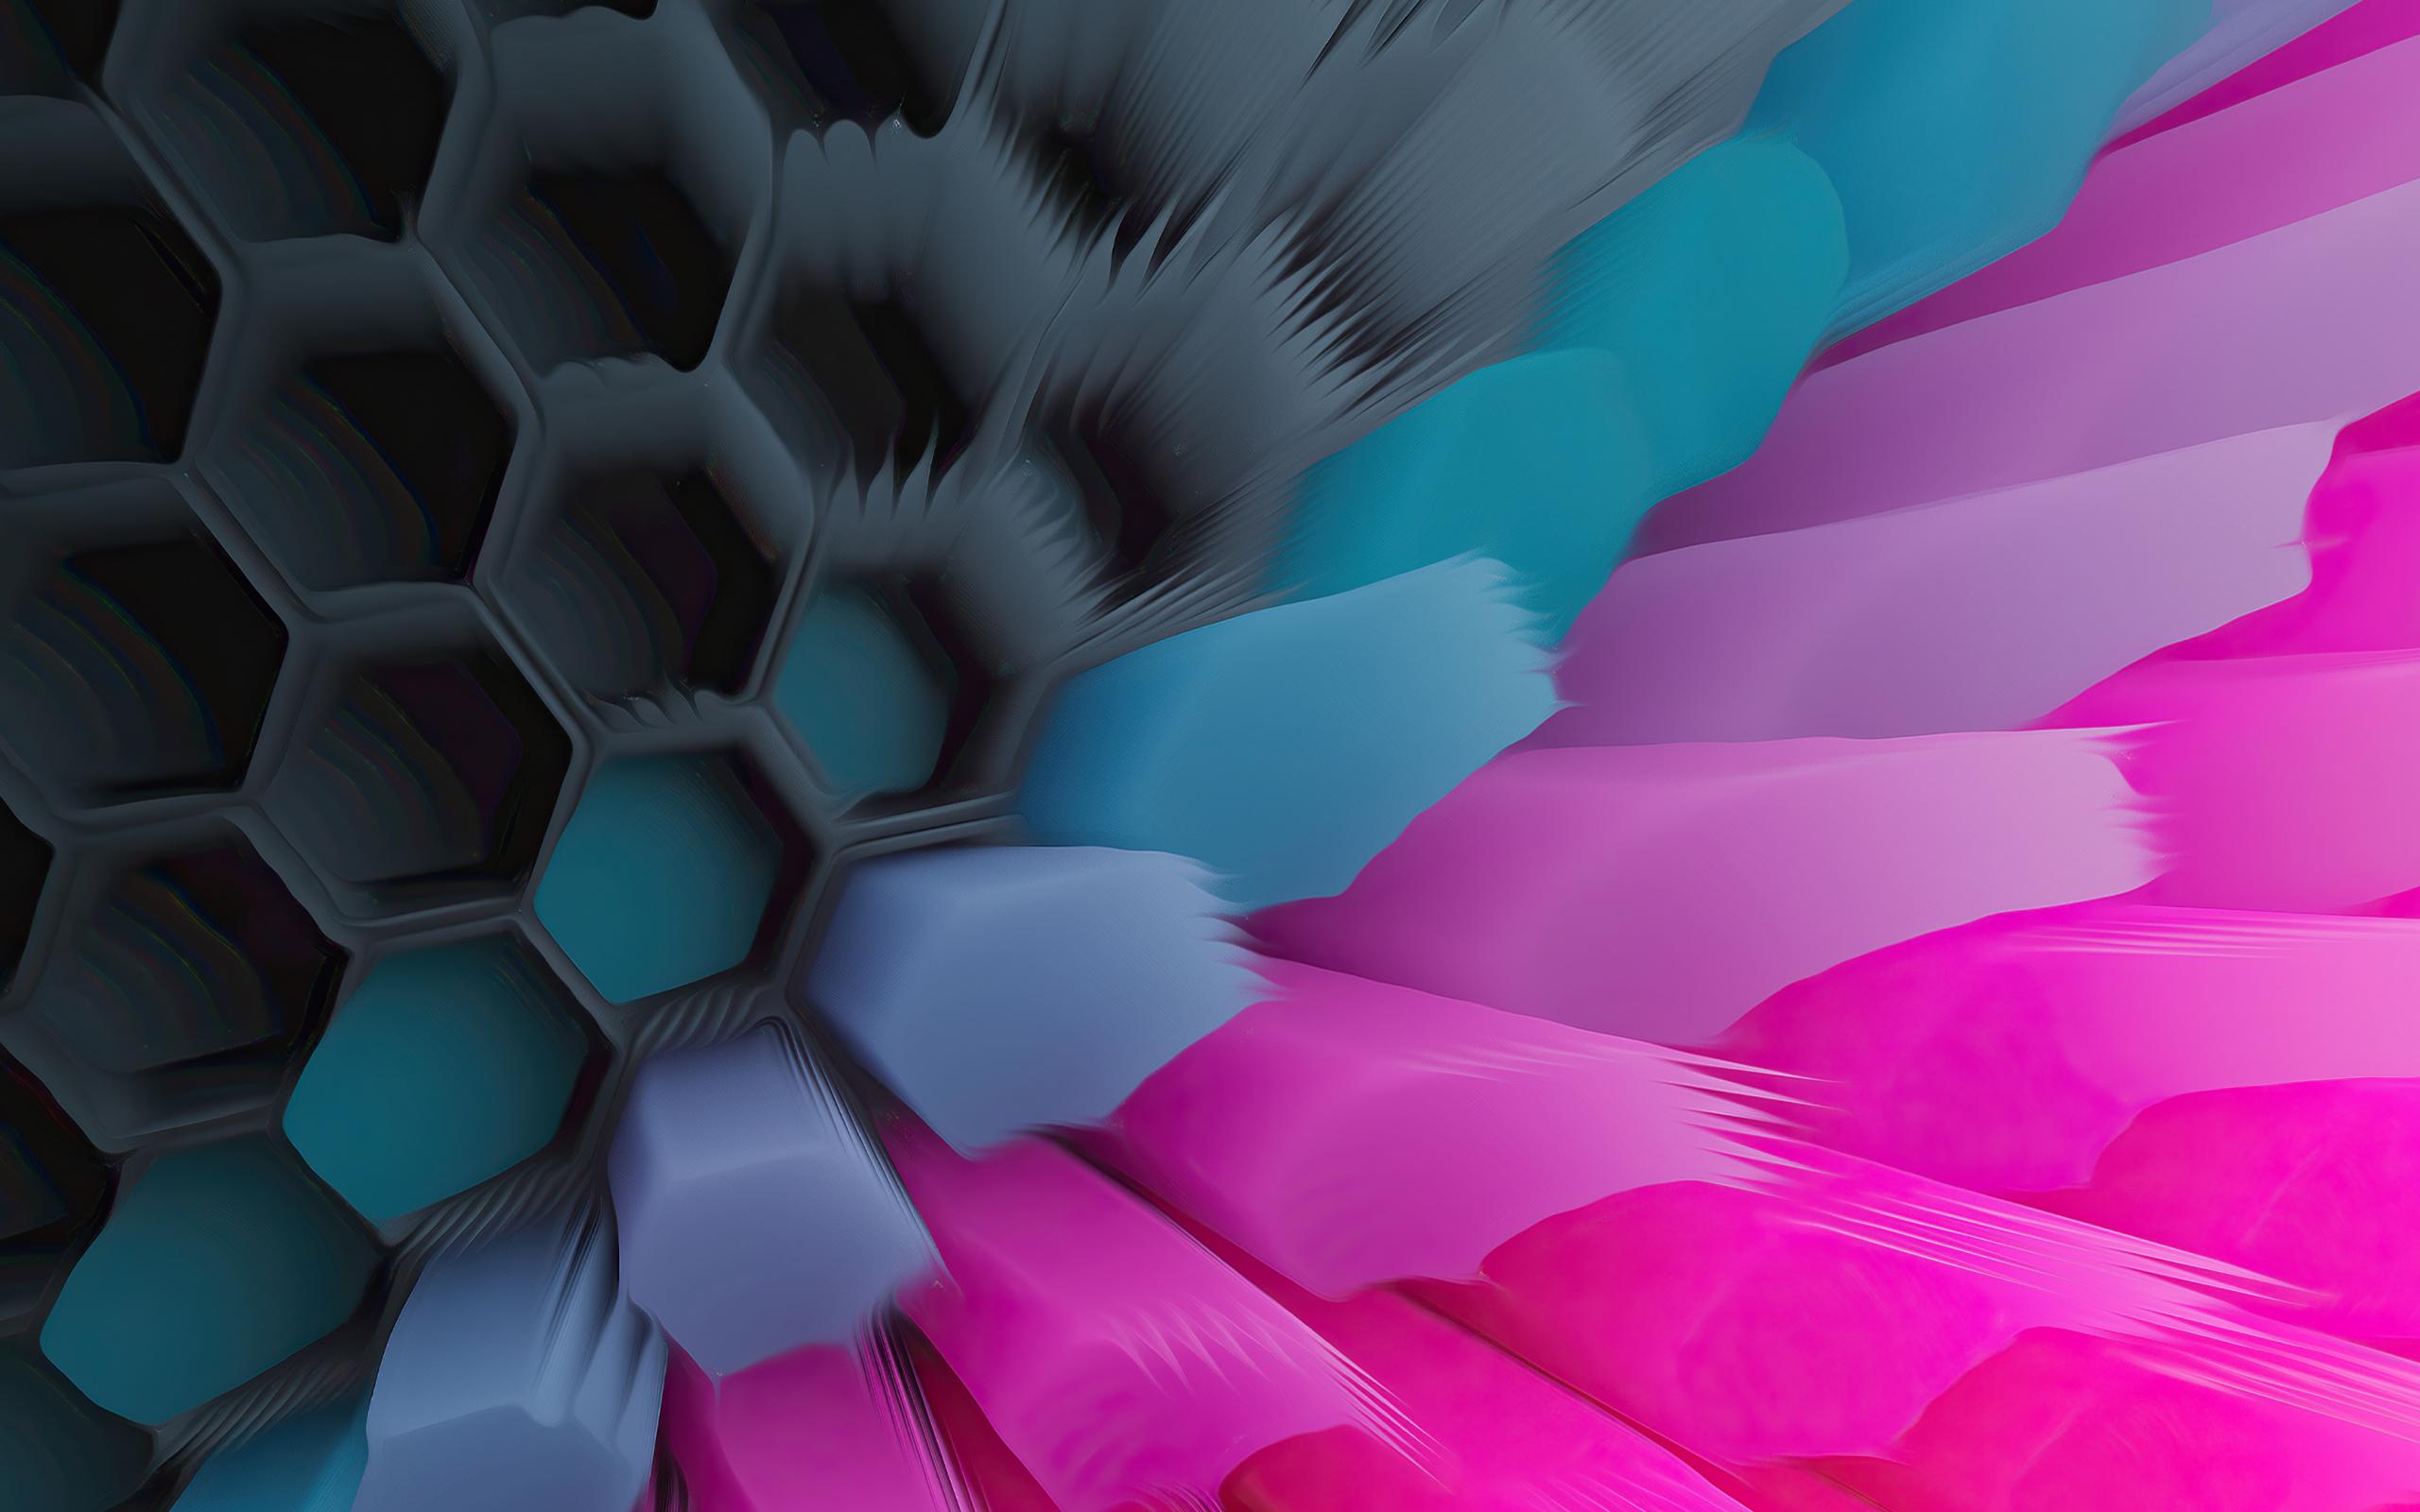 Pink Blue 4K Hexagon Wallpaper in 2560x1600 Resolution